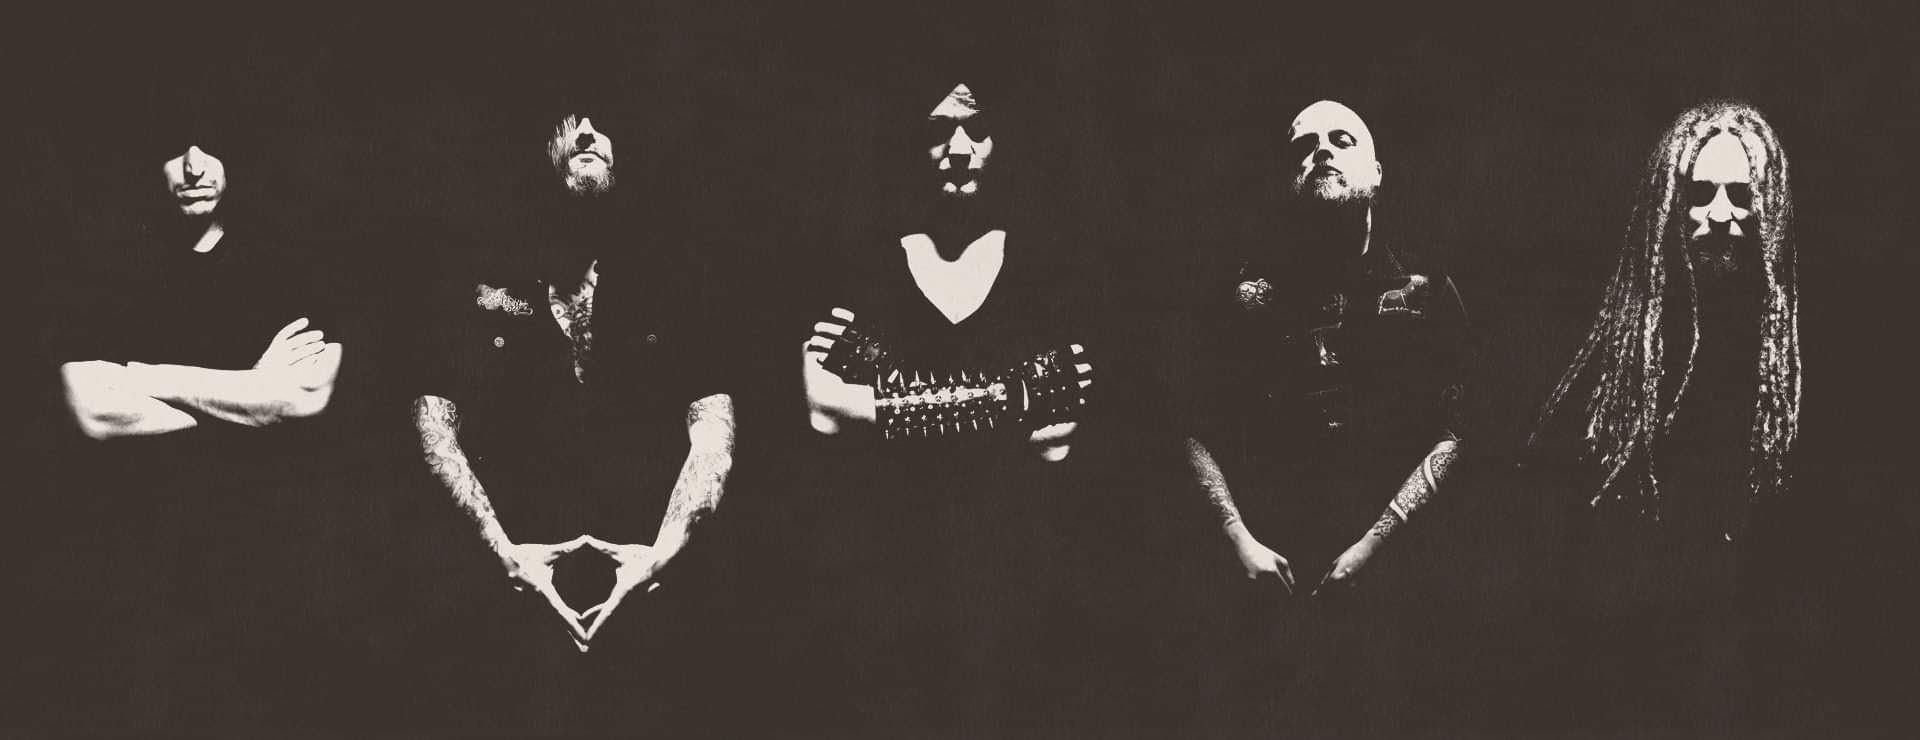 Thron – Una nuova band nel roster L'Alchimie Agency